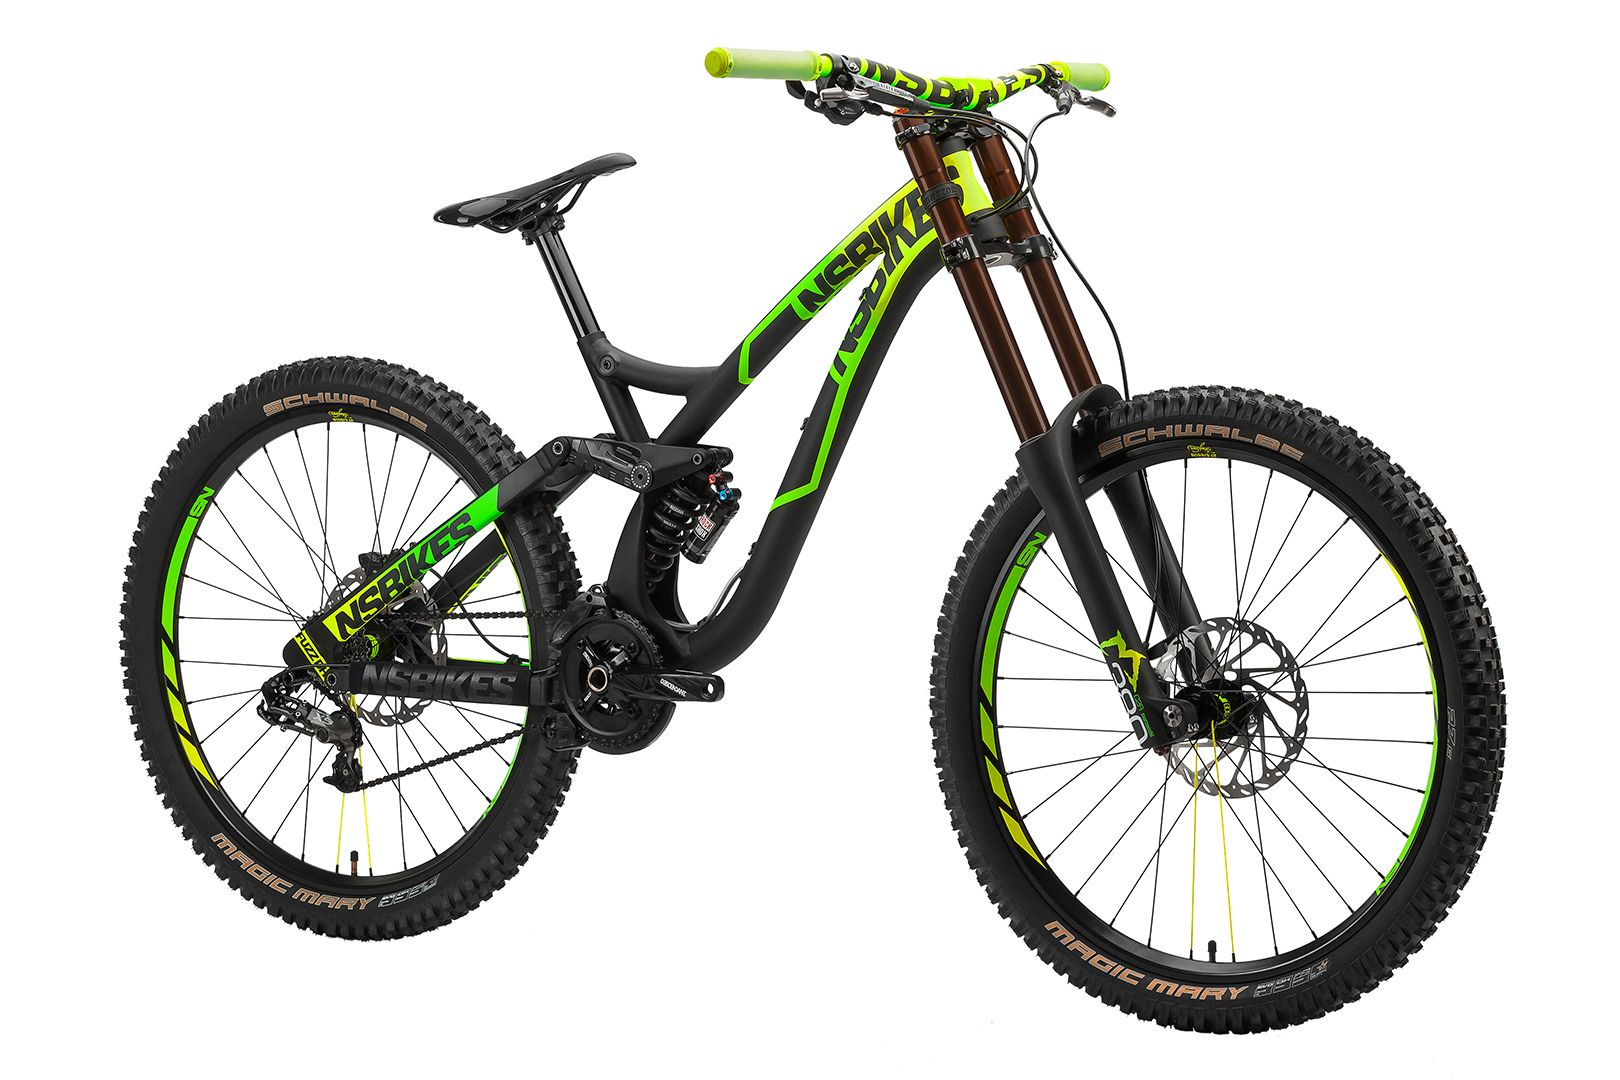 2a48cd4212f NS Bikes - Fuzz 1 - Downhill / Bike park | Lampshade | Downhill bike ...